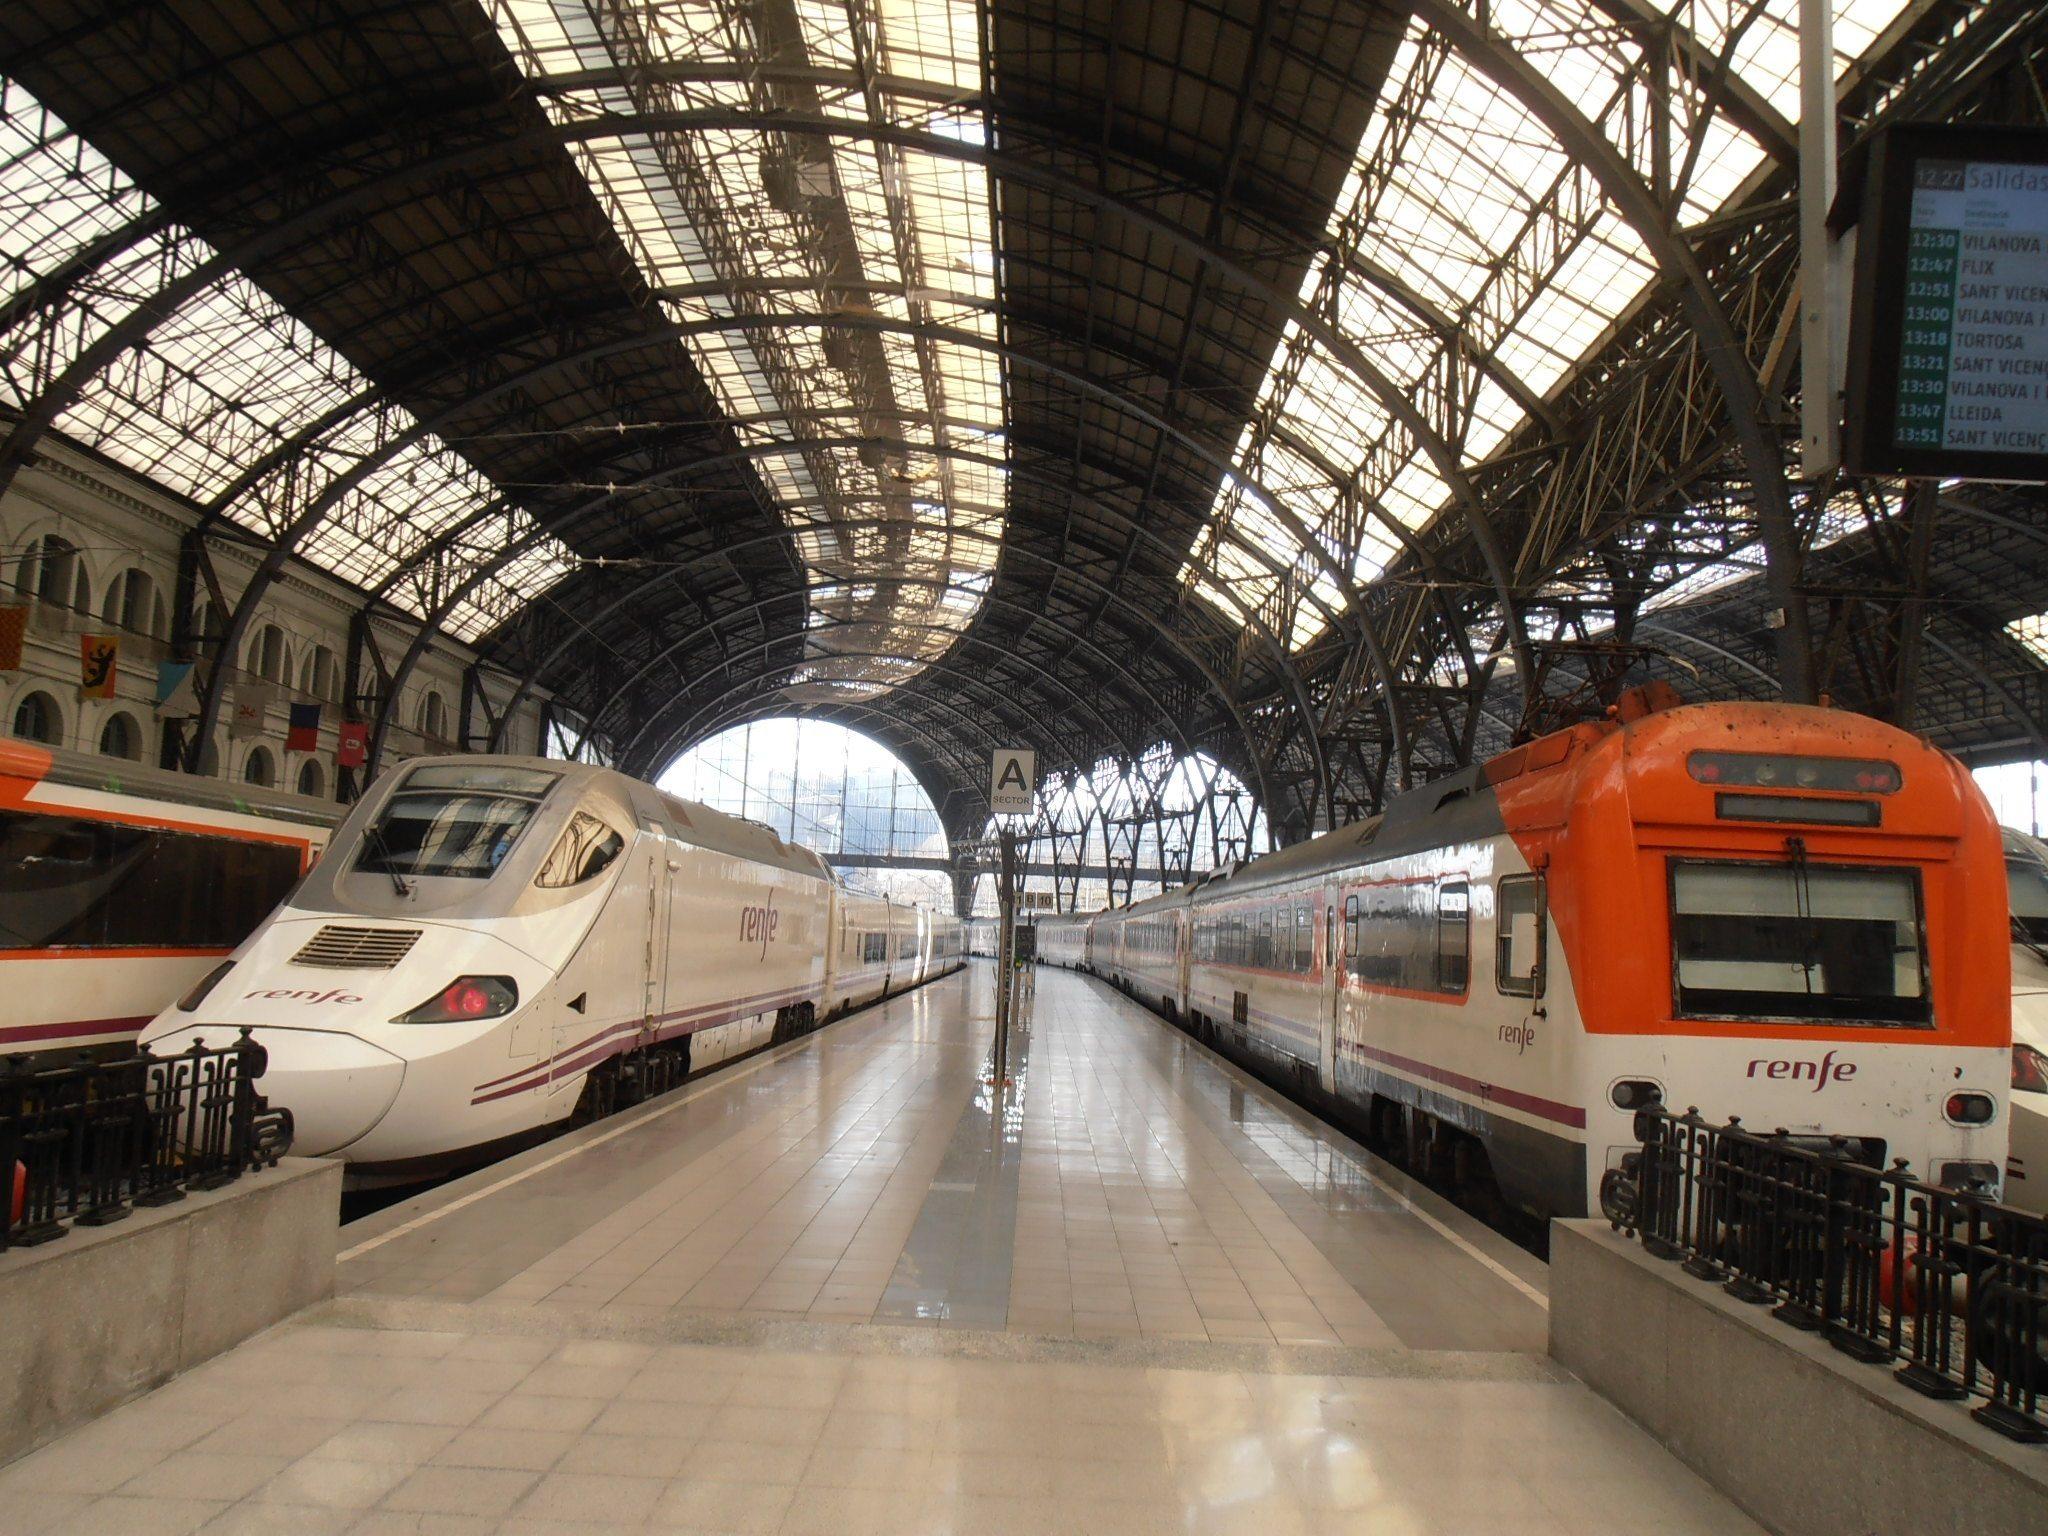 Is public transportation in Barcelona safe?